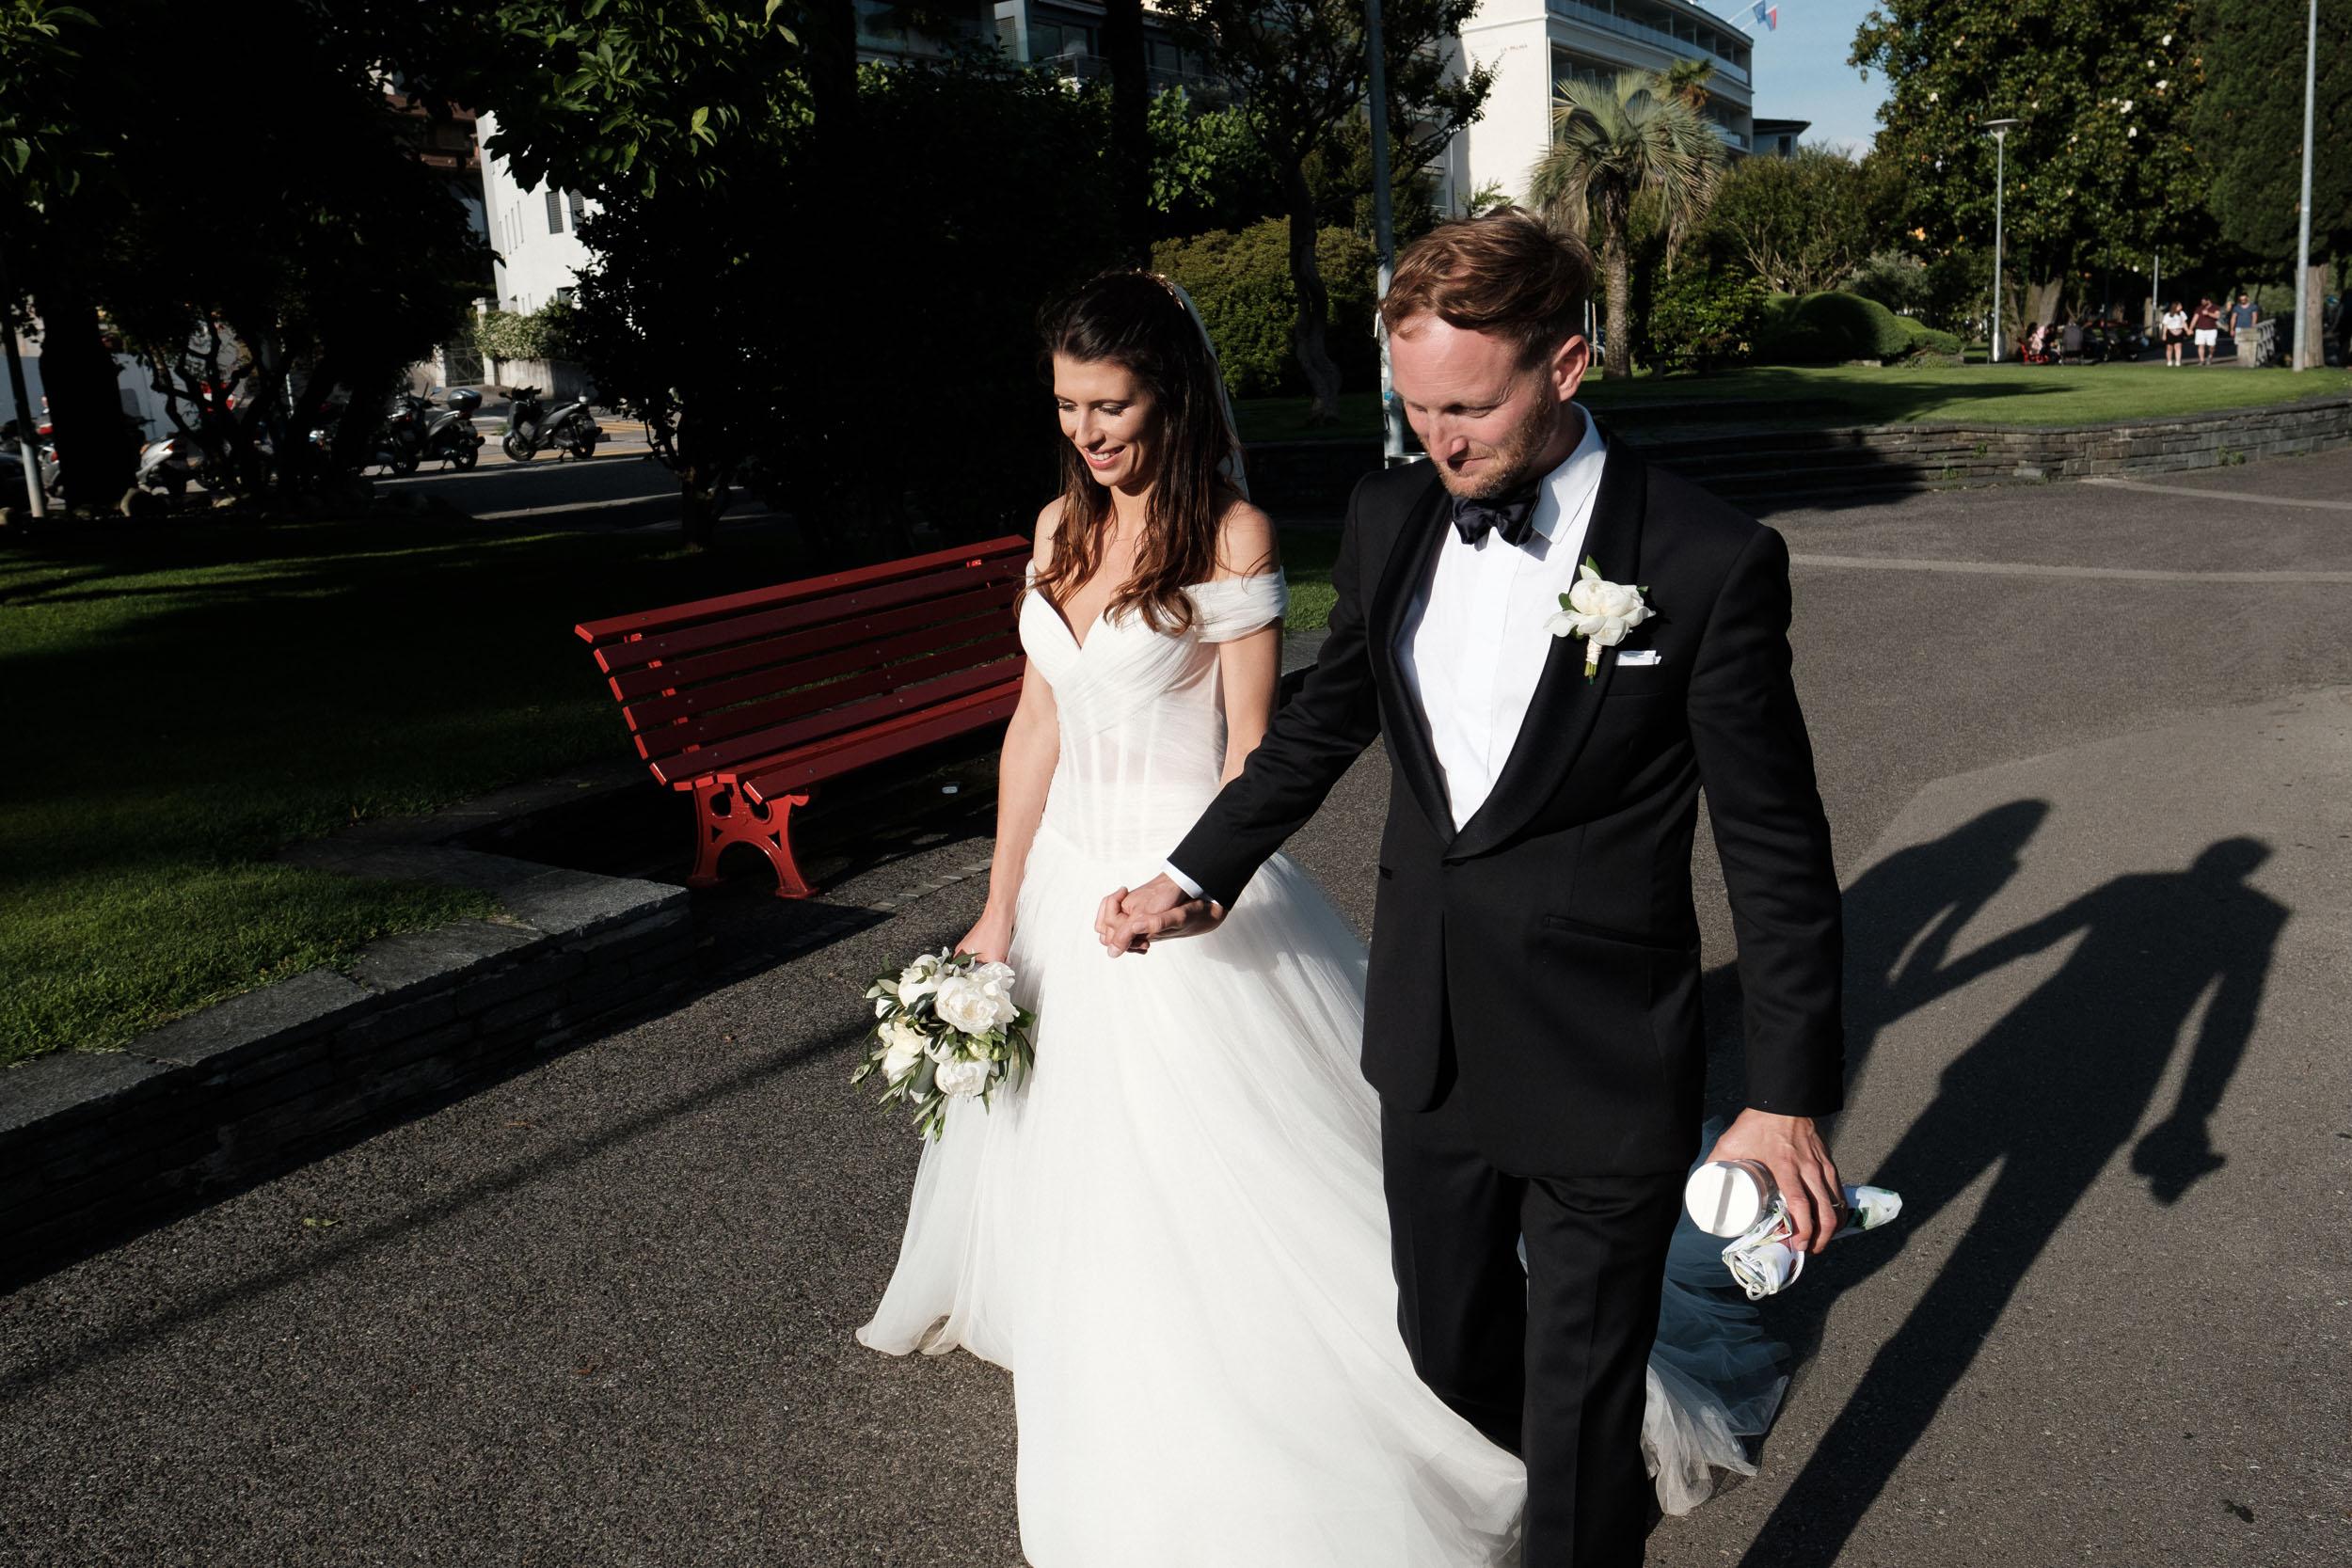 olivia-andreas-wedding-switzerland-448.jpg